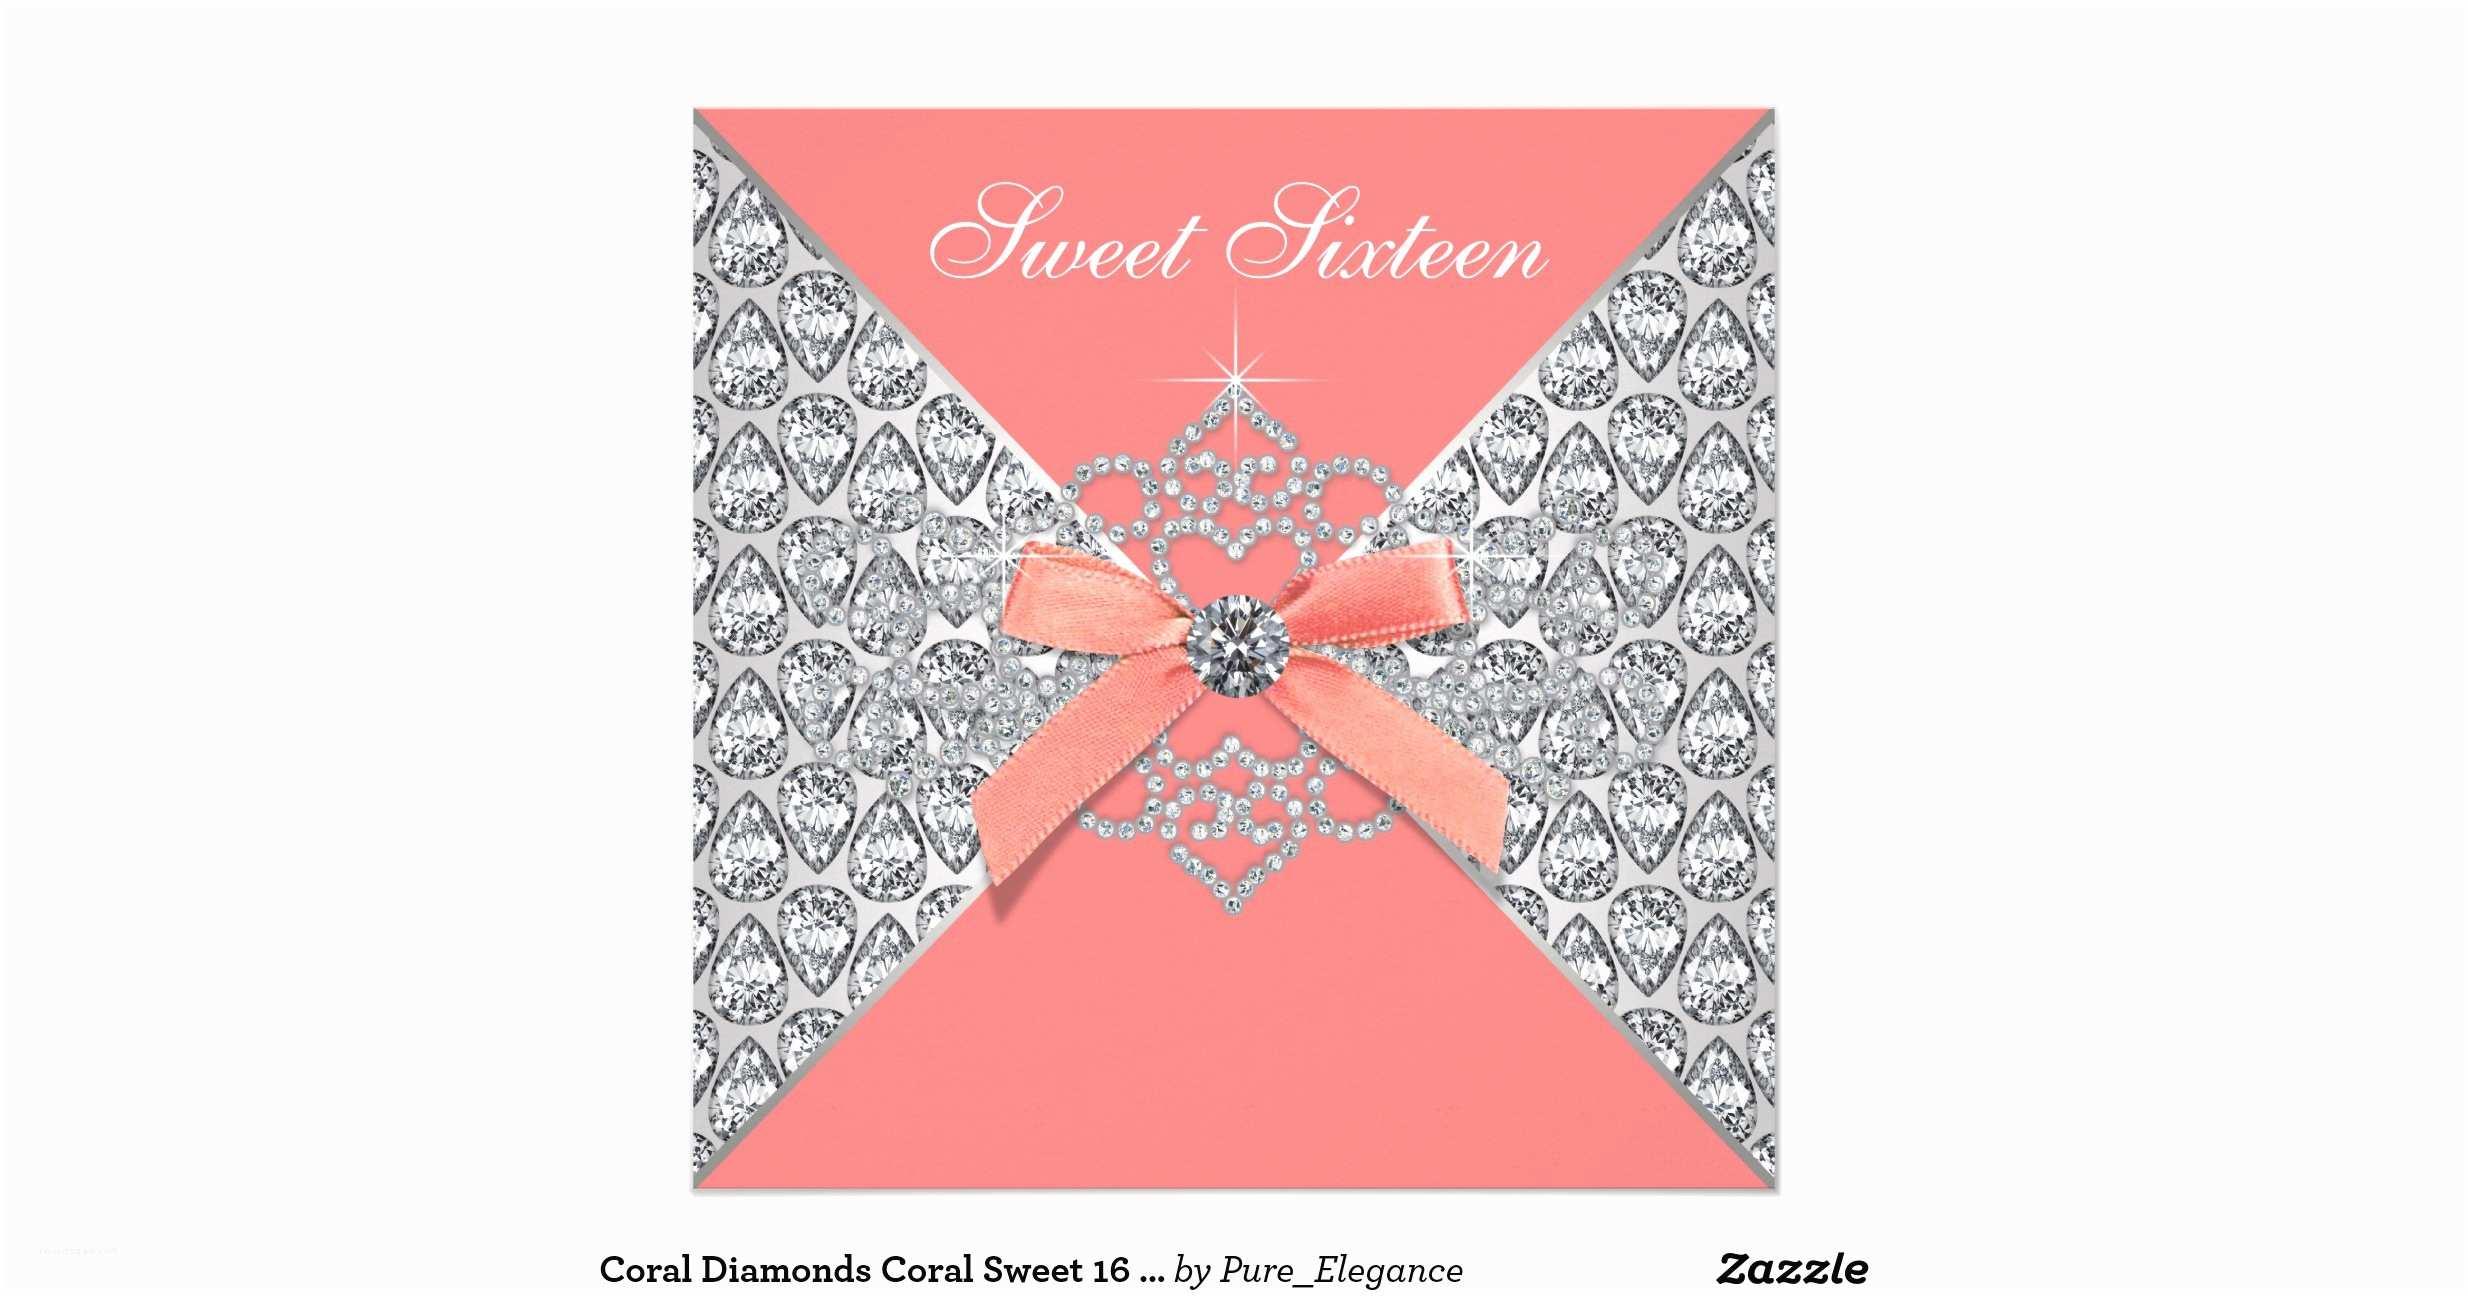 Coral Quinceanera Invitations Coral Diamonds Coral Sweet 16 Birthday Party Invitation